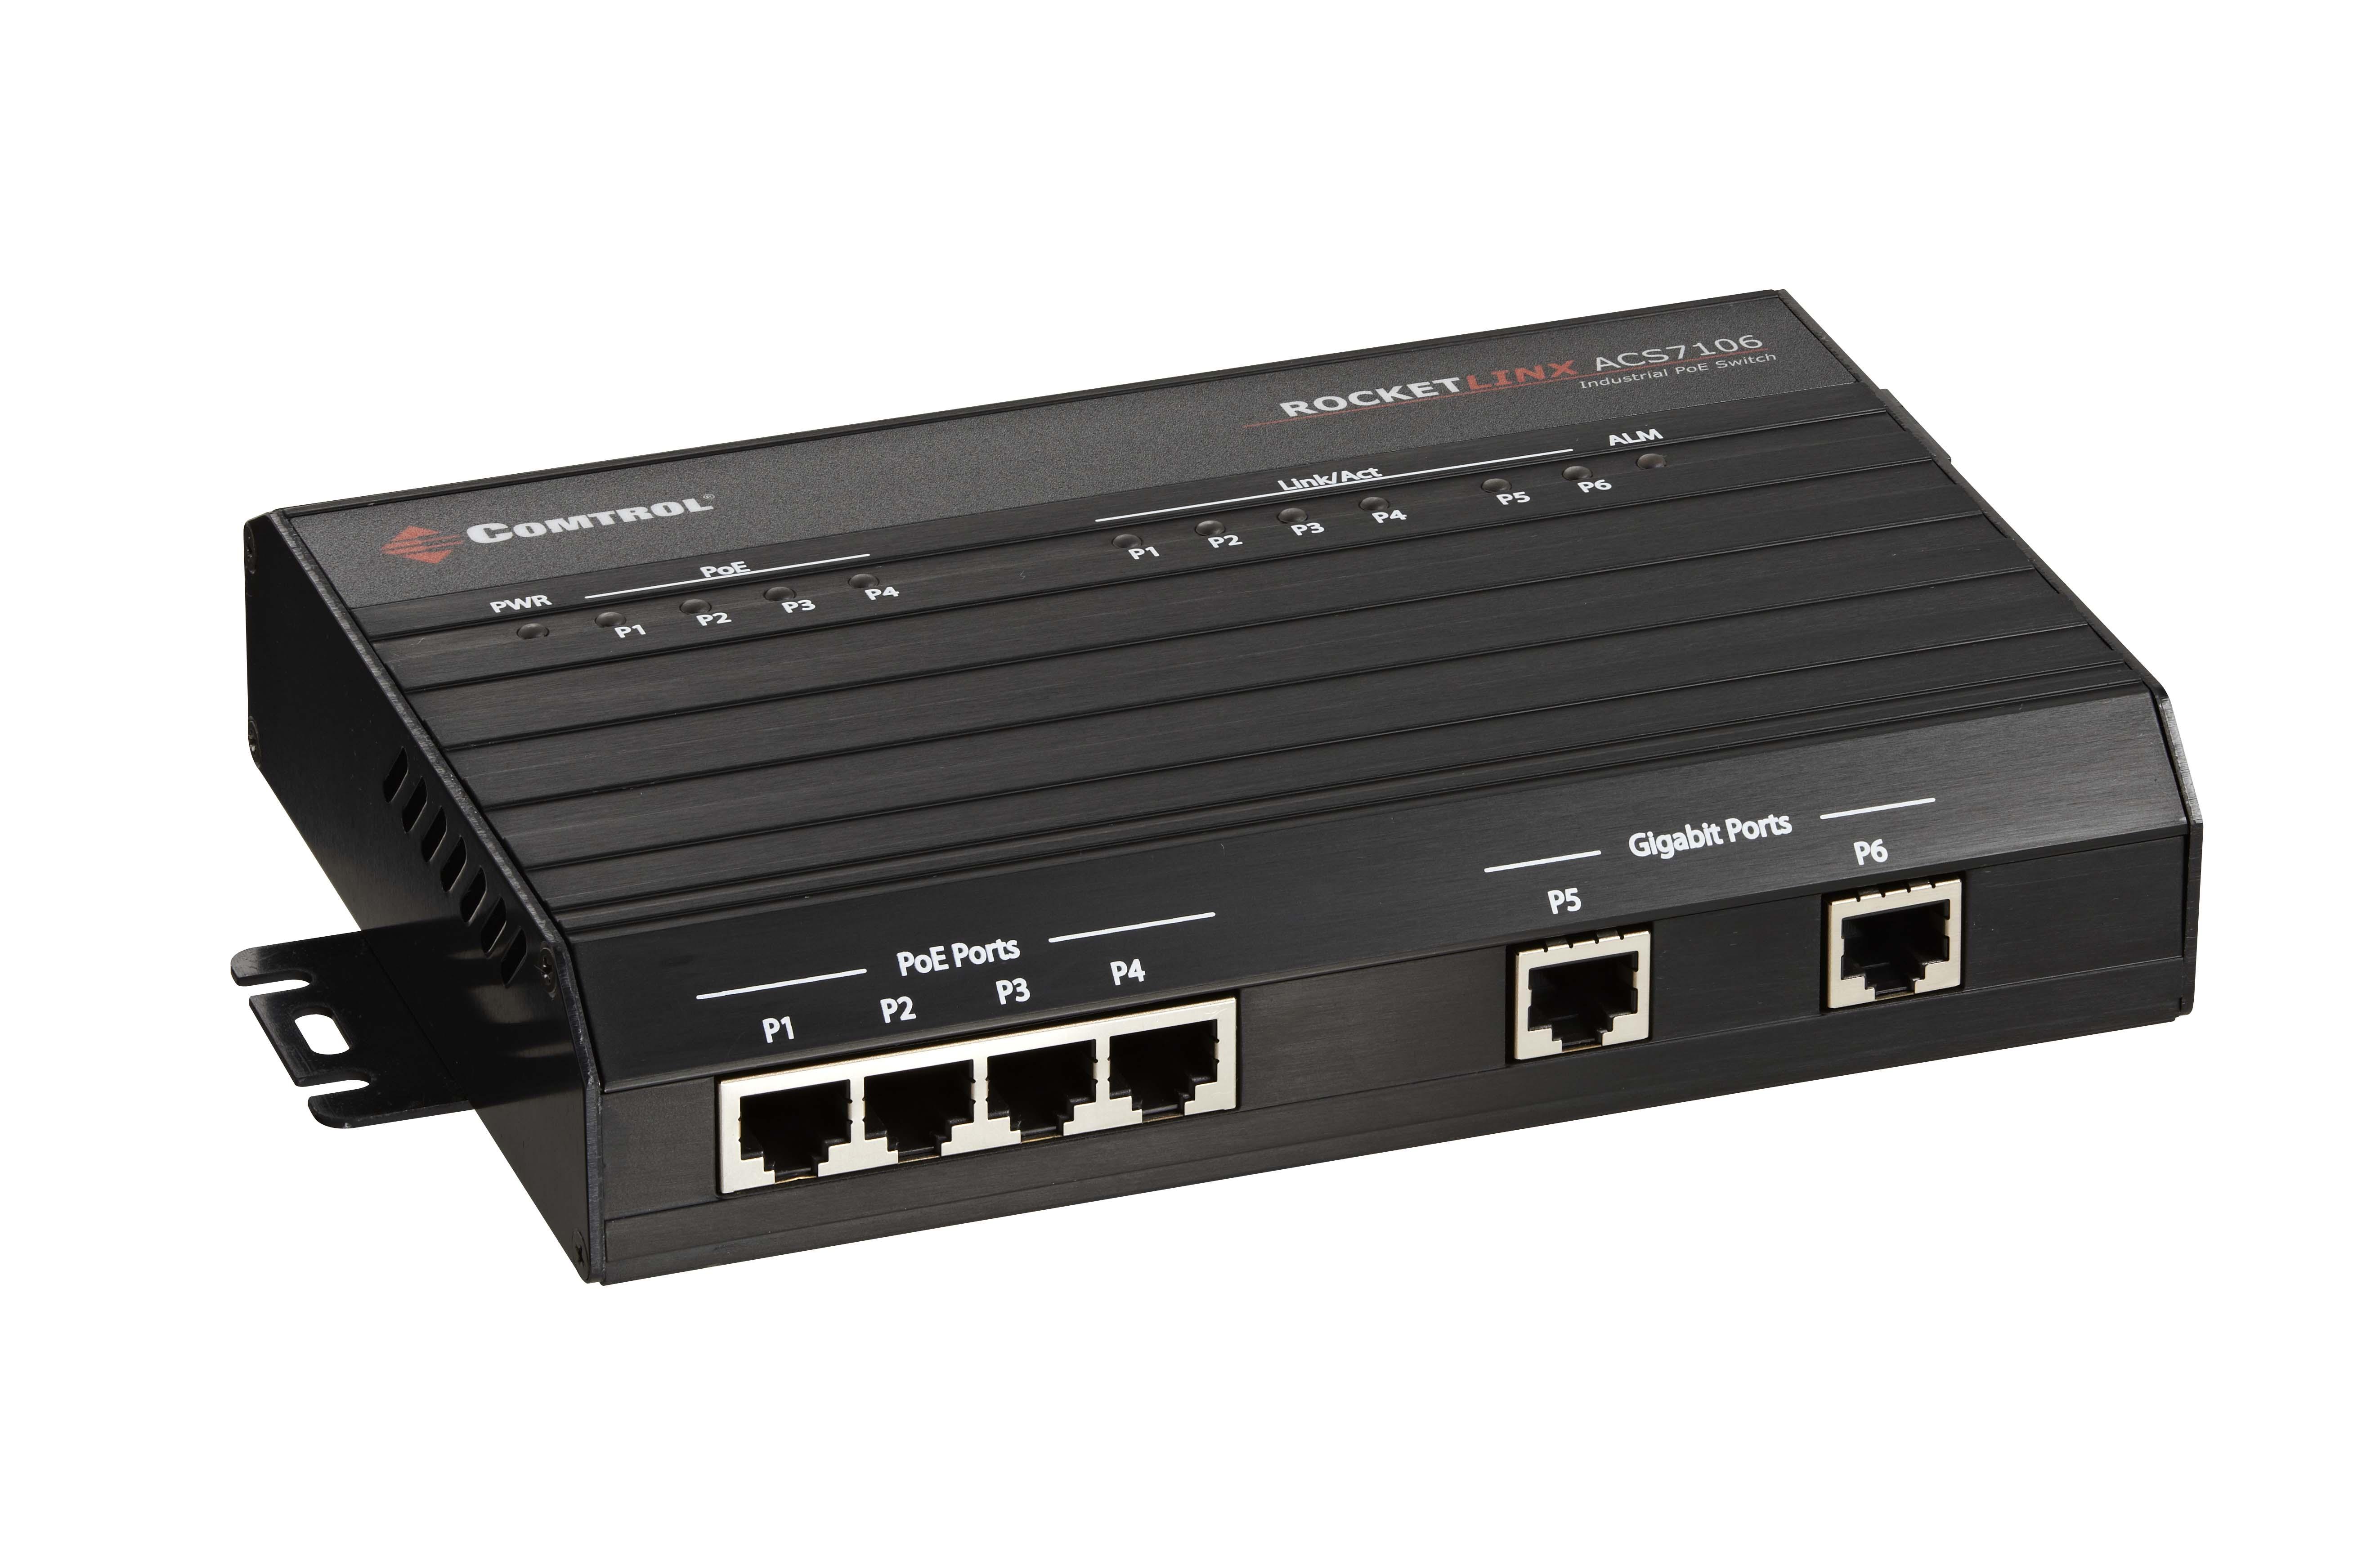 RocketLinx ACS7106